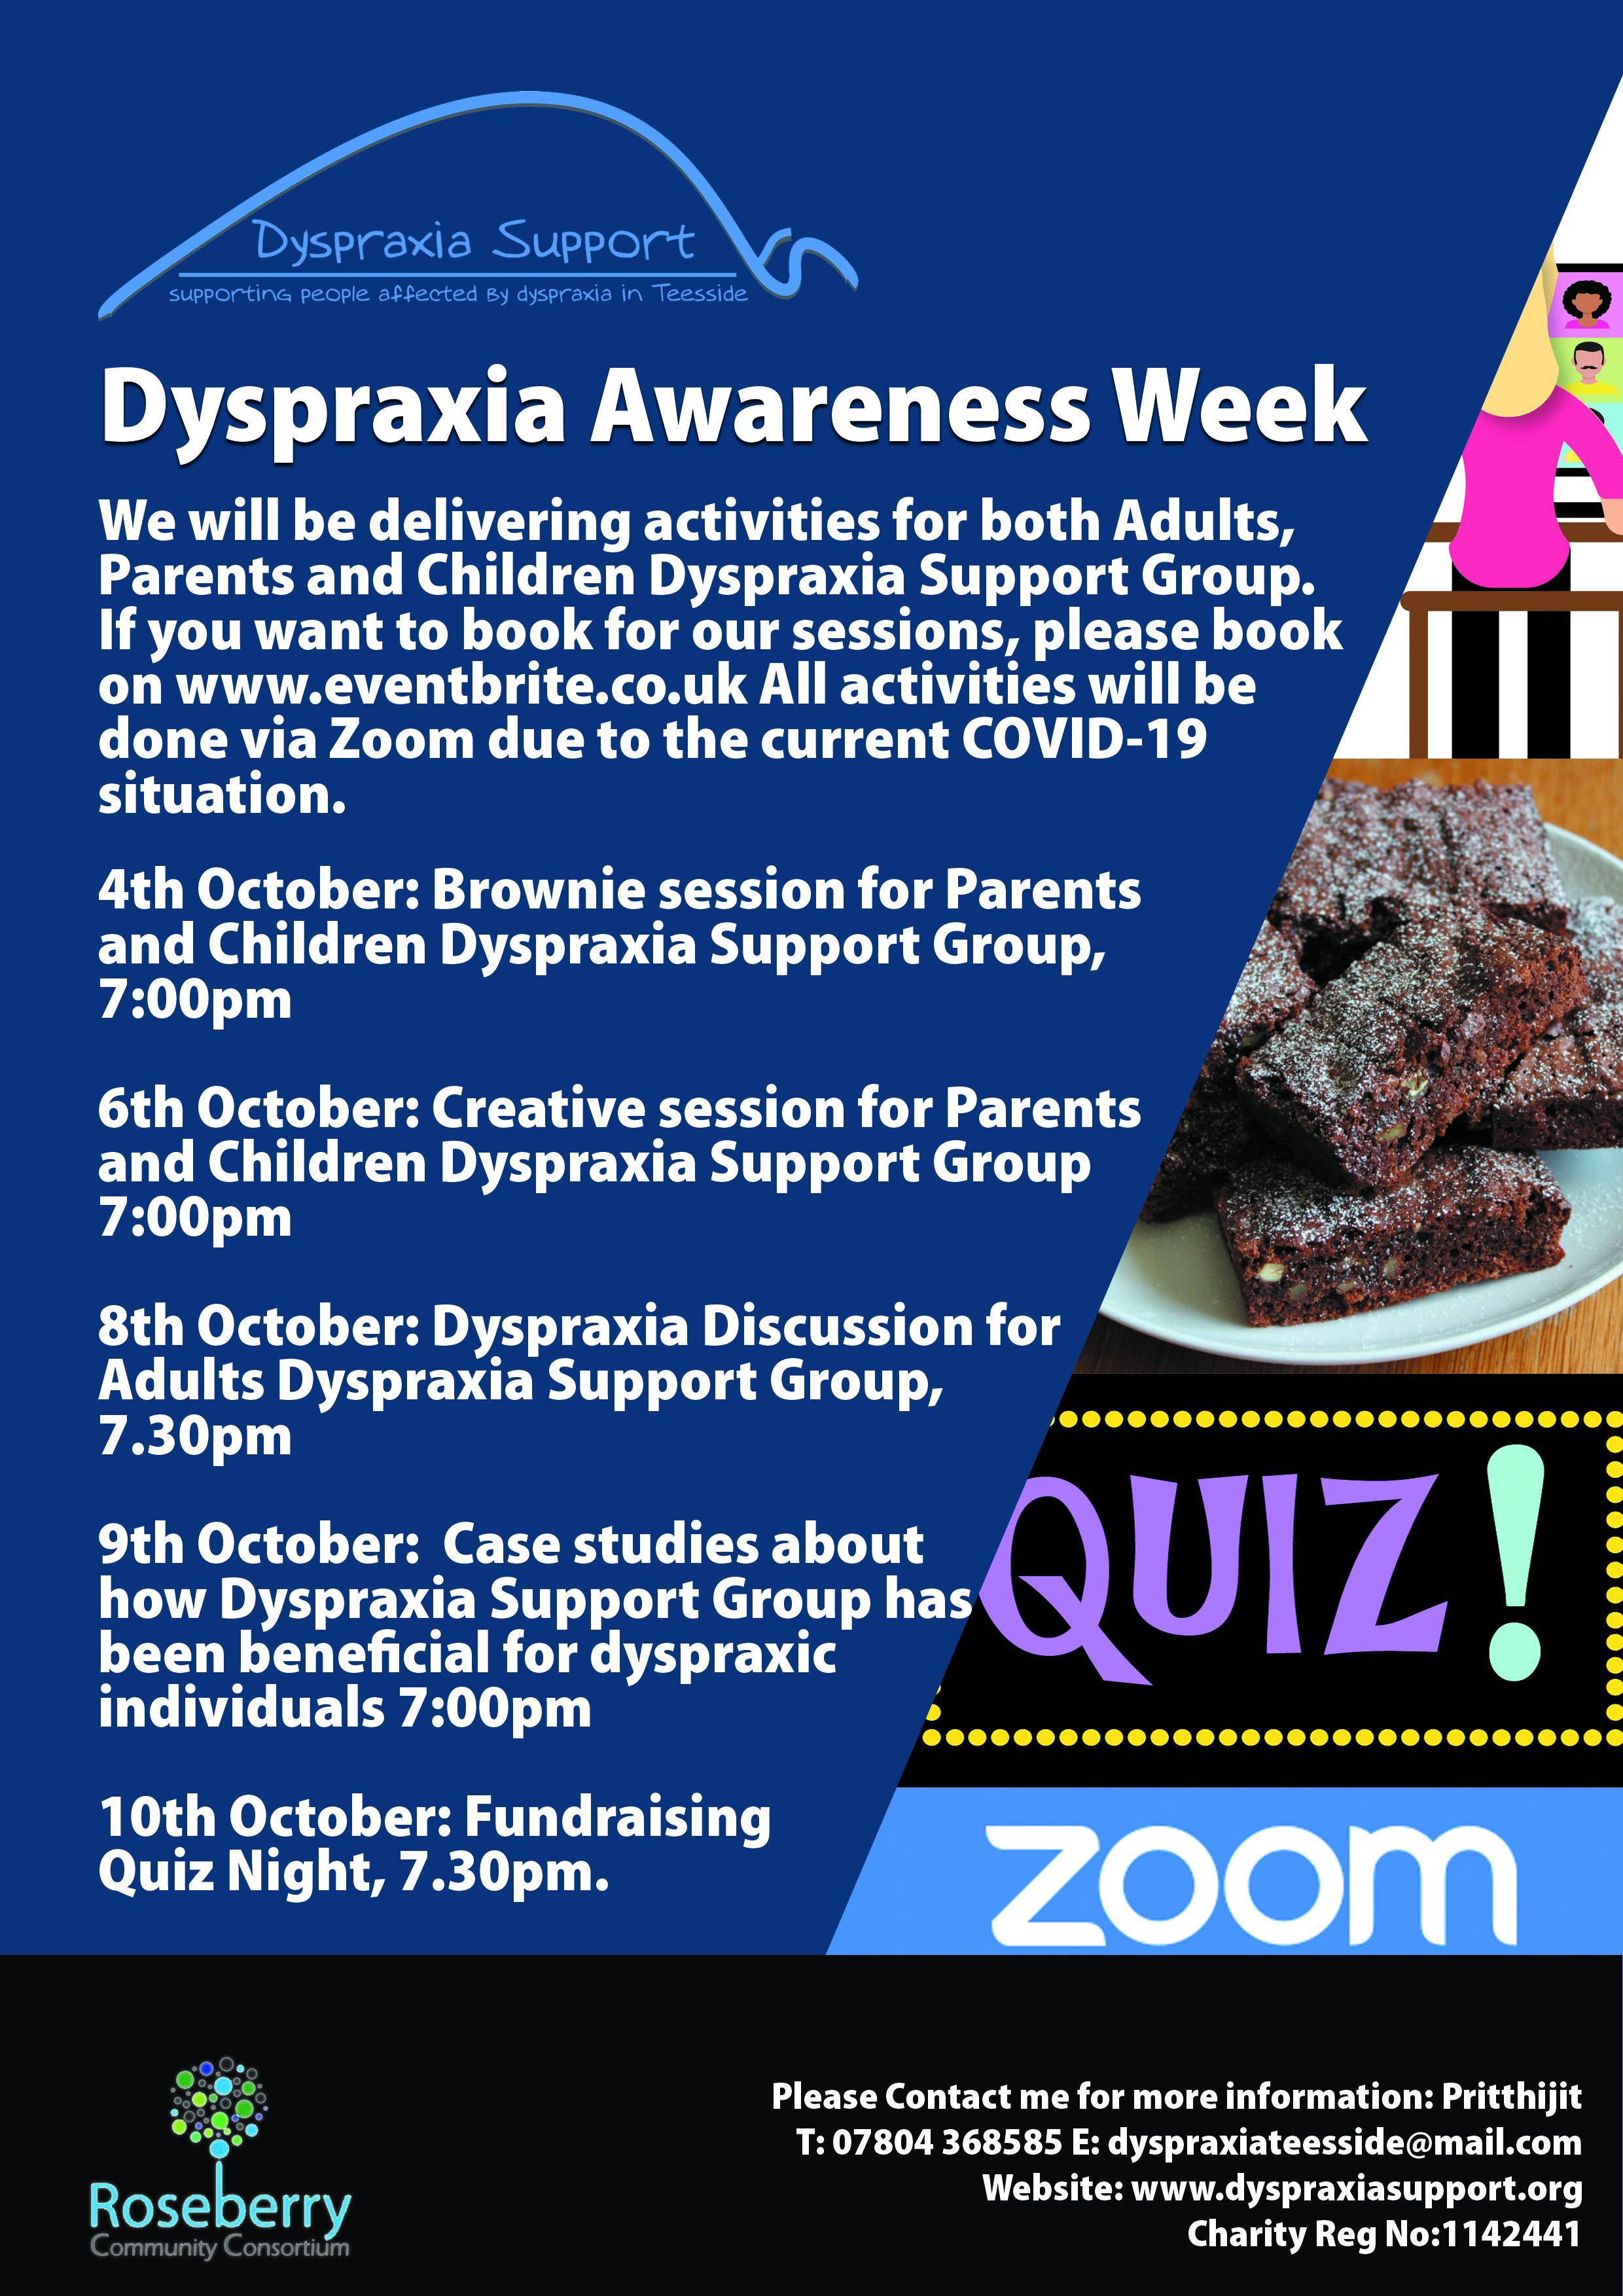 Dyspraxia Awareness Week Poster 2020